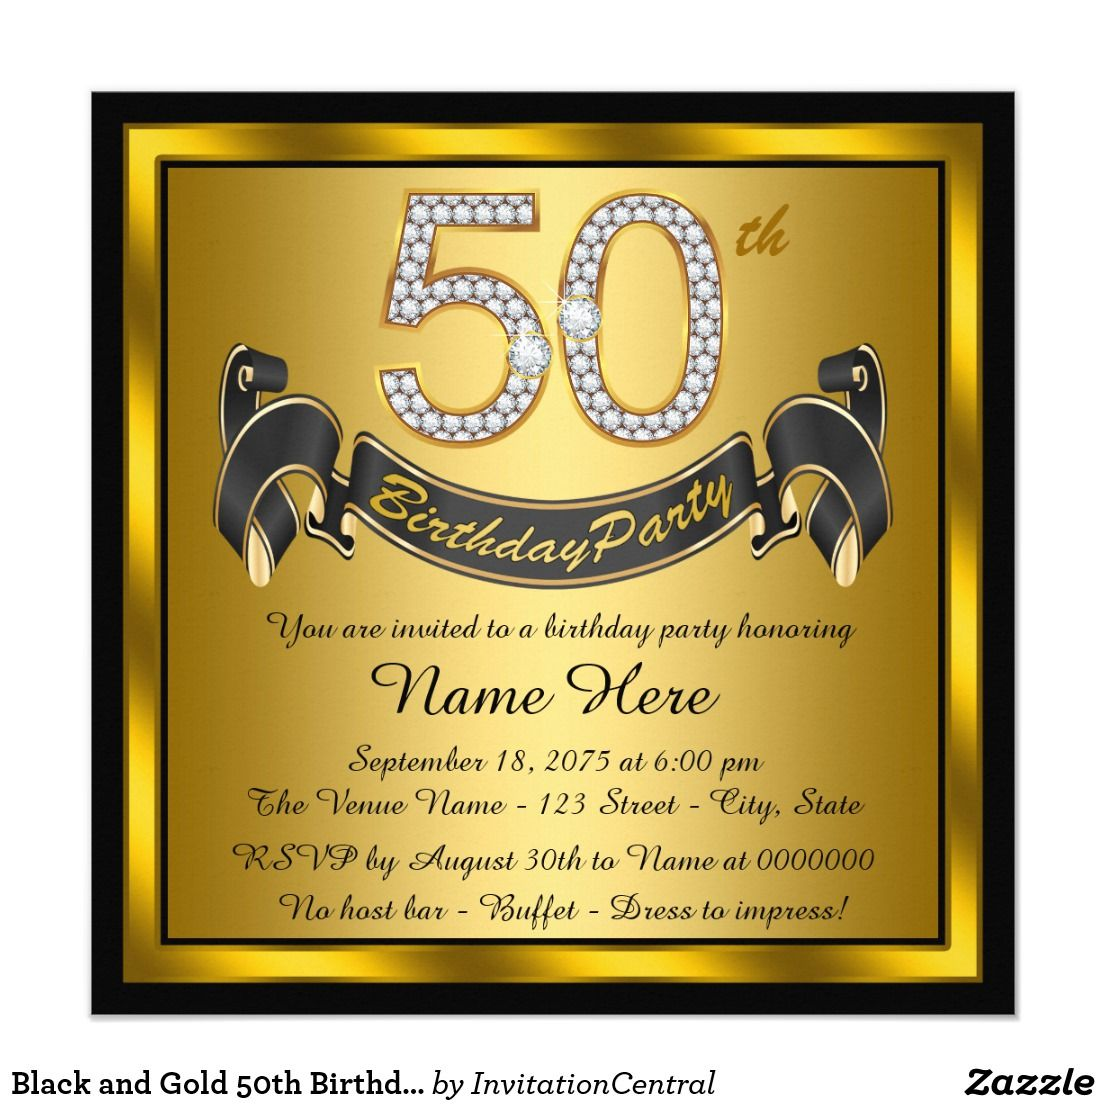 Black and Gold 50th Birthday Party Invitation | Zazzle.com | Personalized birthday  invitations, Birthday party invitation templates, 75th birthday parties